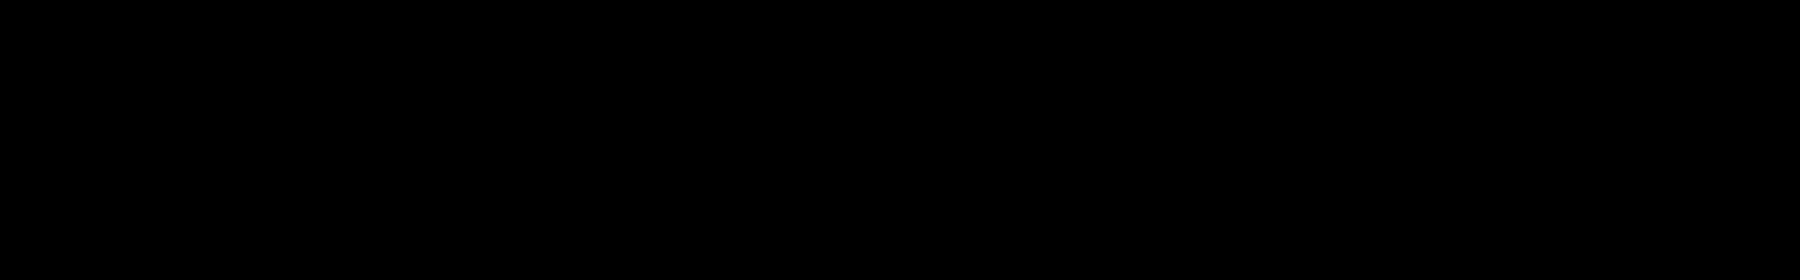 NatLife - April Sun (FL Studio ATB Style Template) audio waveform